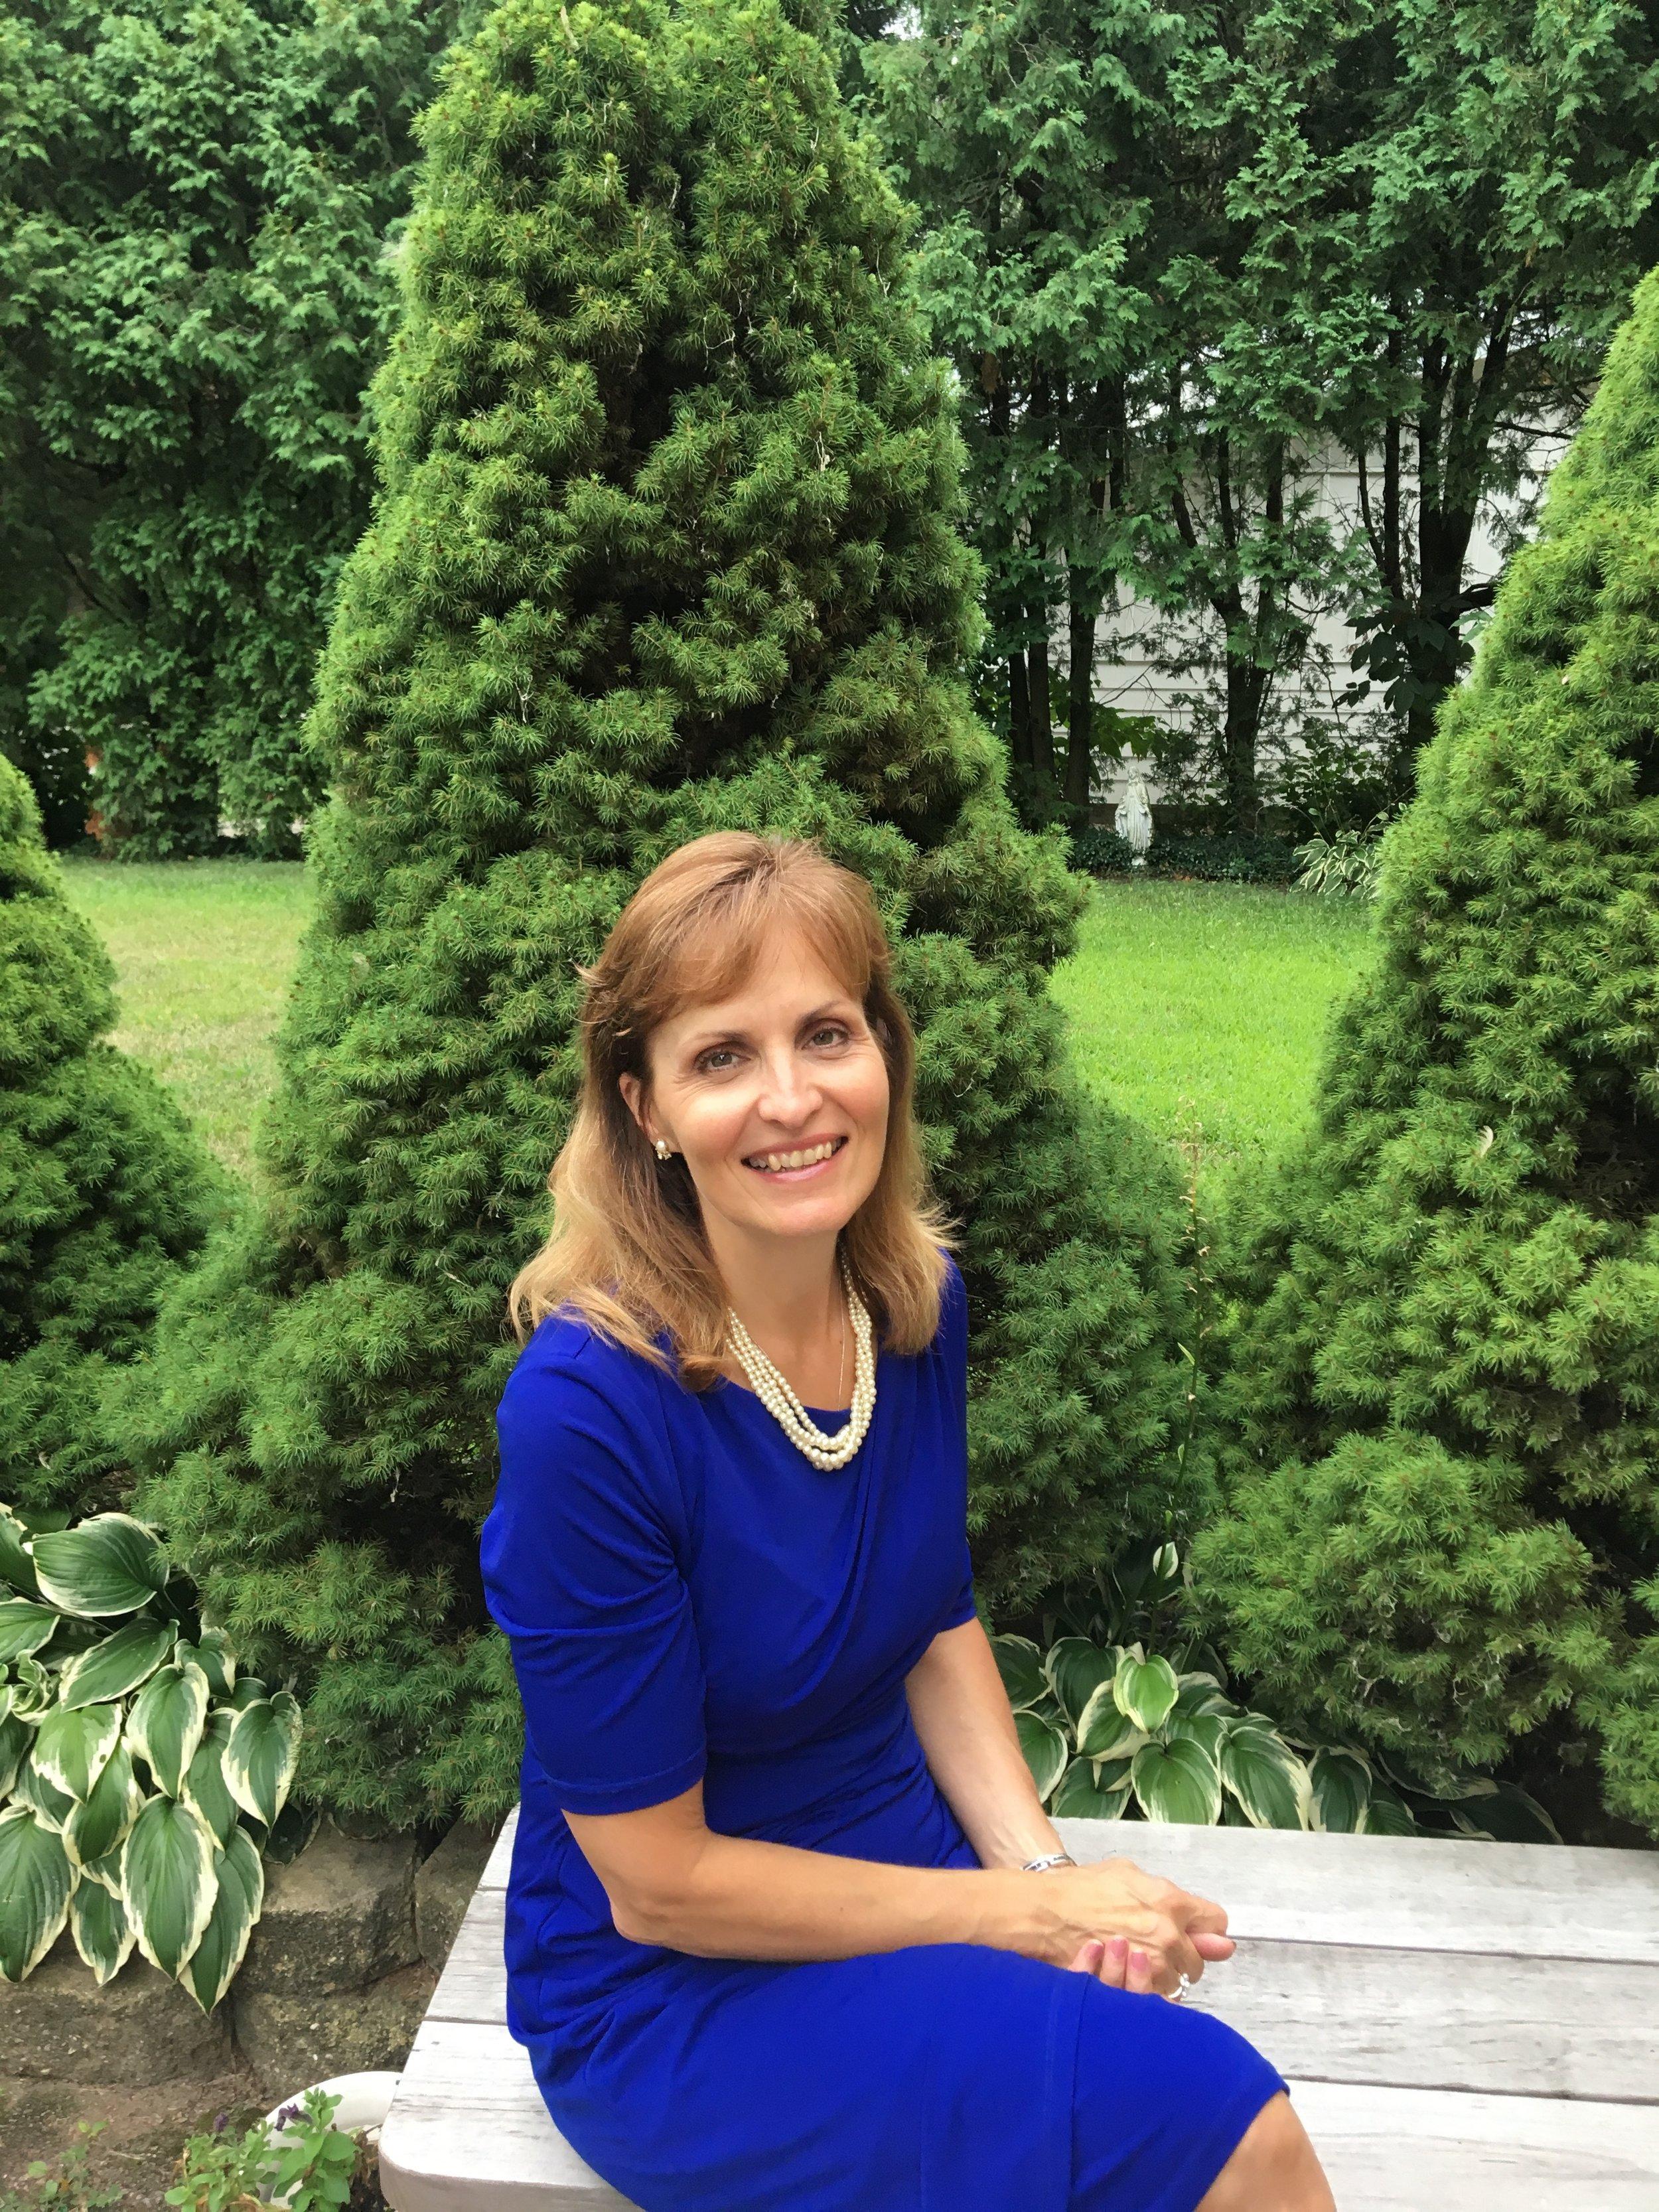 Lucia Bim-Merle - Pastoral Associate/DRE219-962-4507Email: lvbimmerle@gmail.com